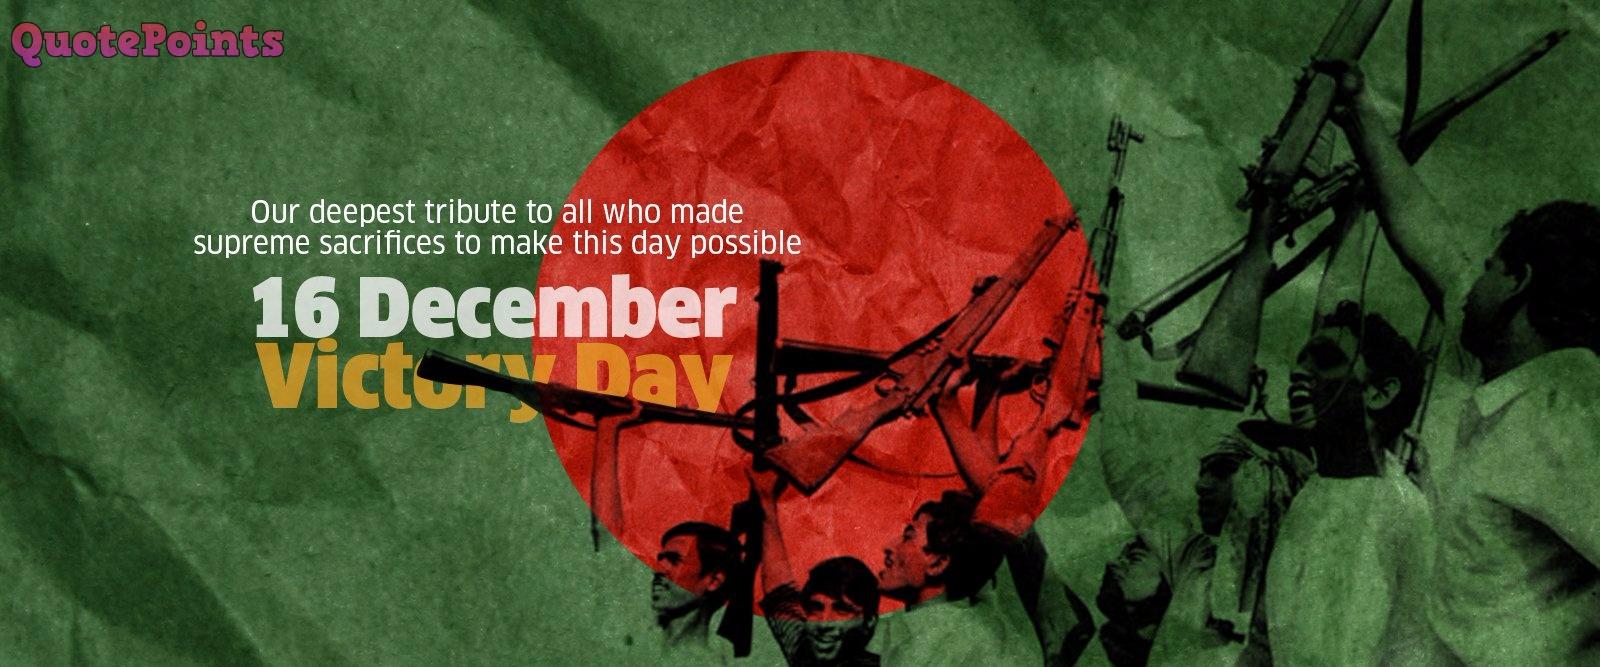 bangladesh victory day banner download